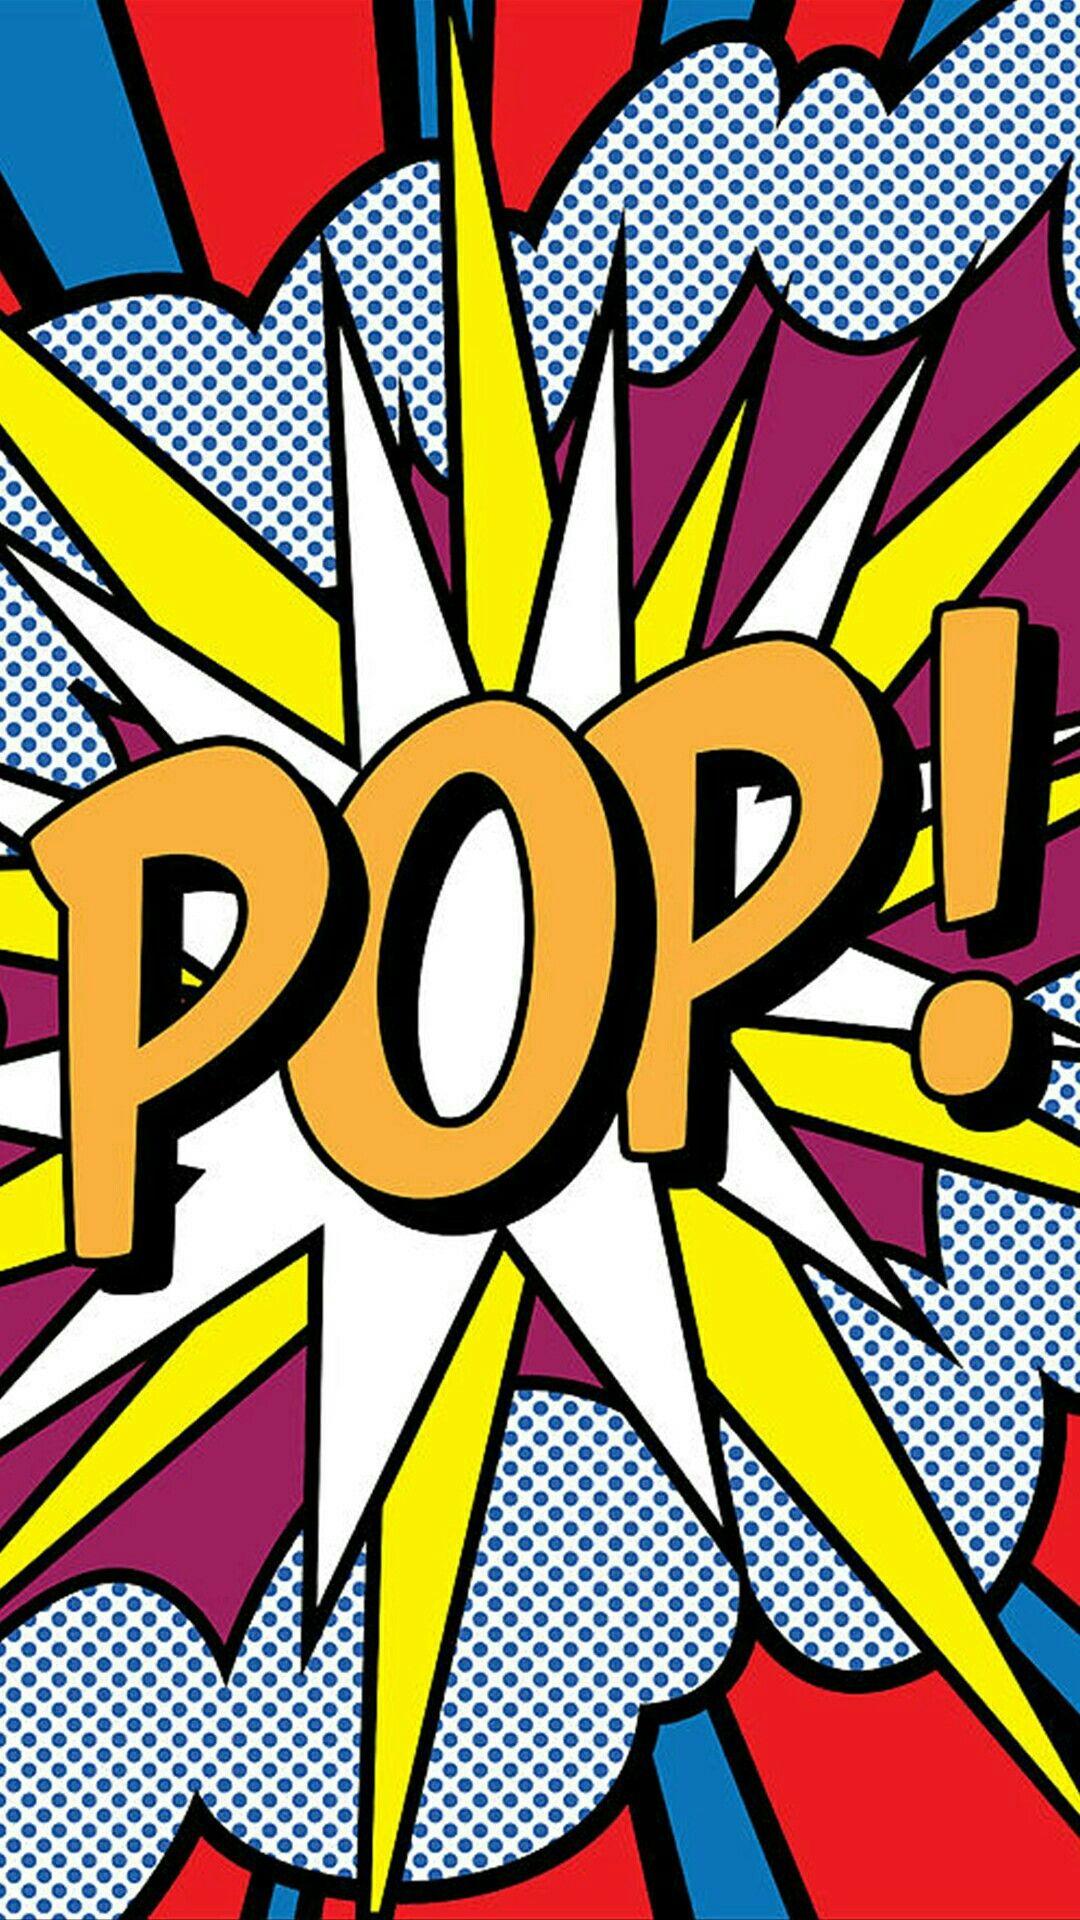 pinindigo sunshine on pop in 2019 | pop art wallpaper, pop art